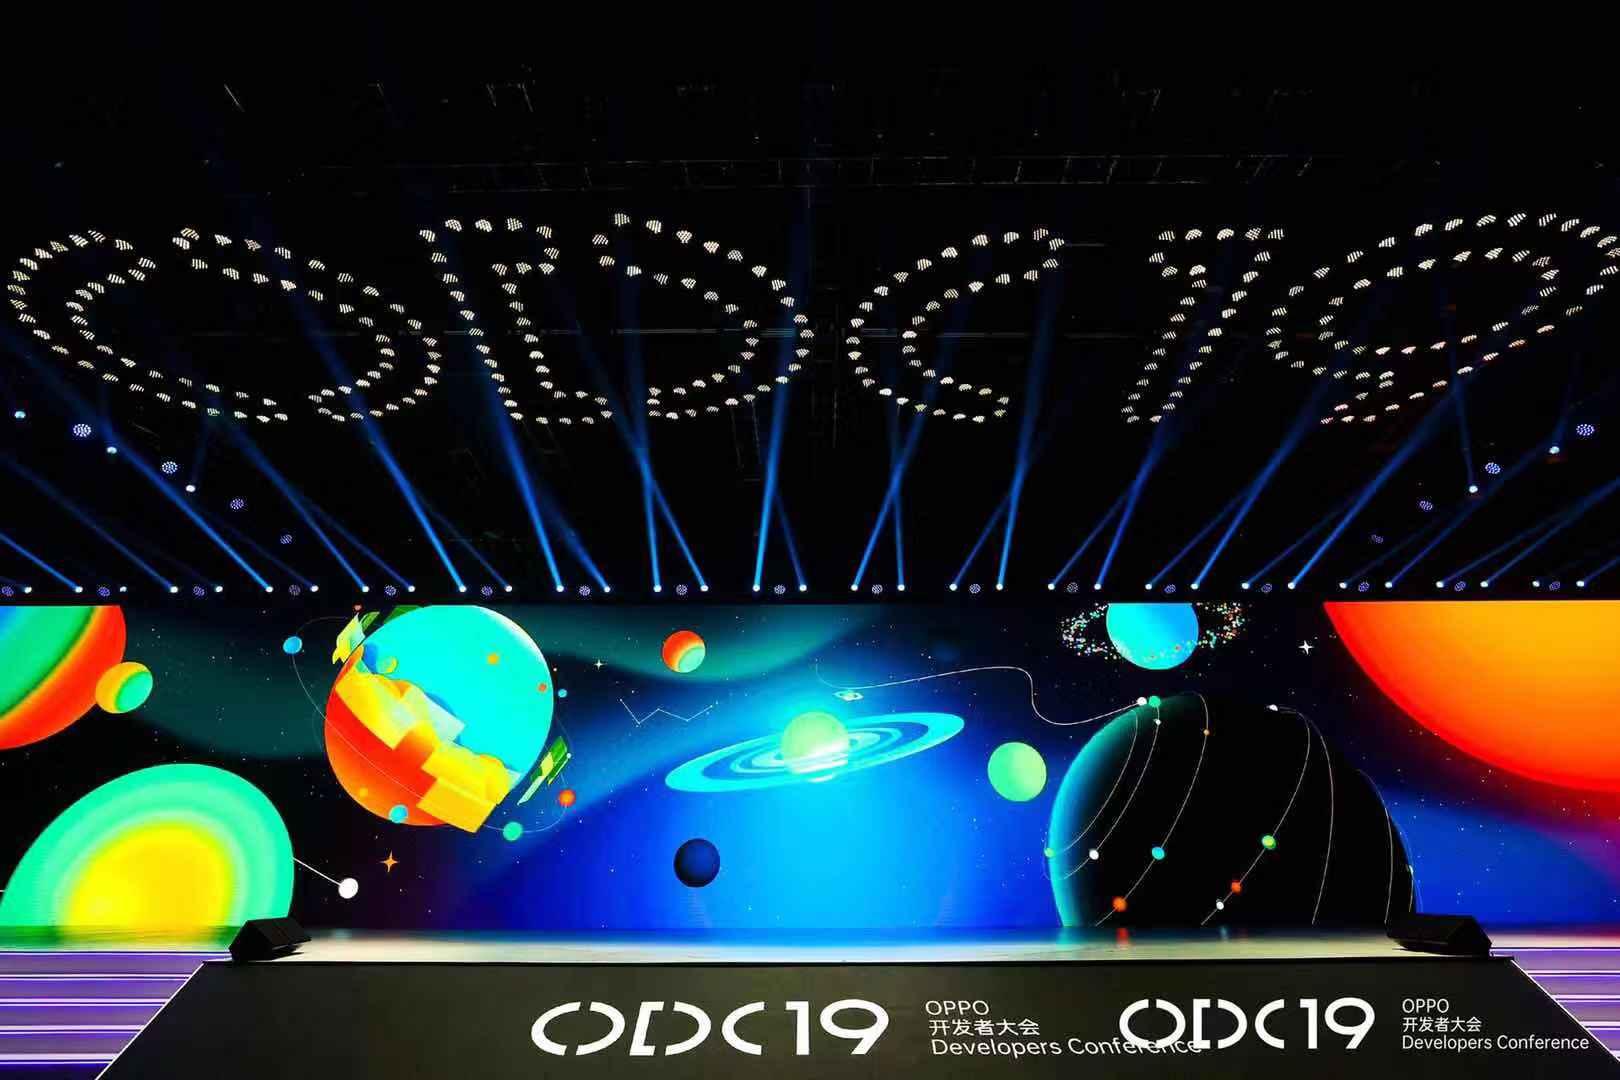 OPPO Developer Conference 2